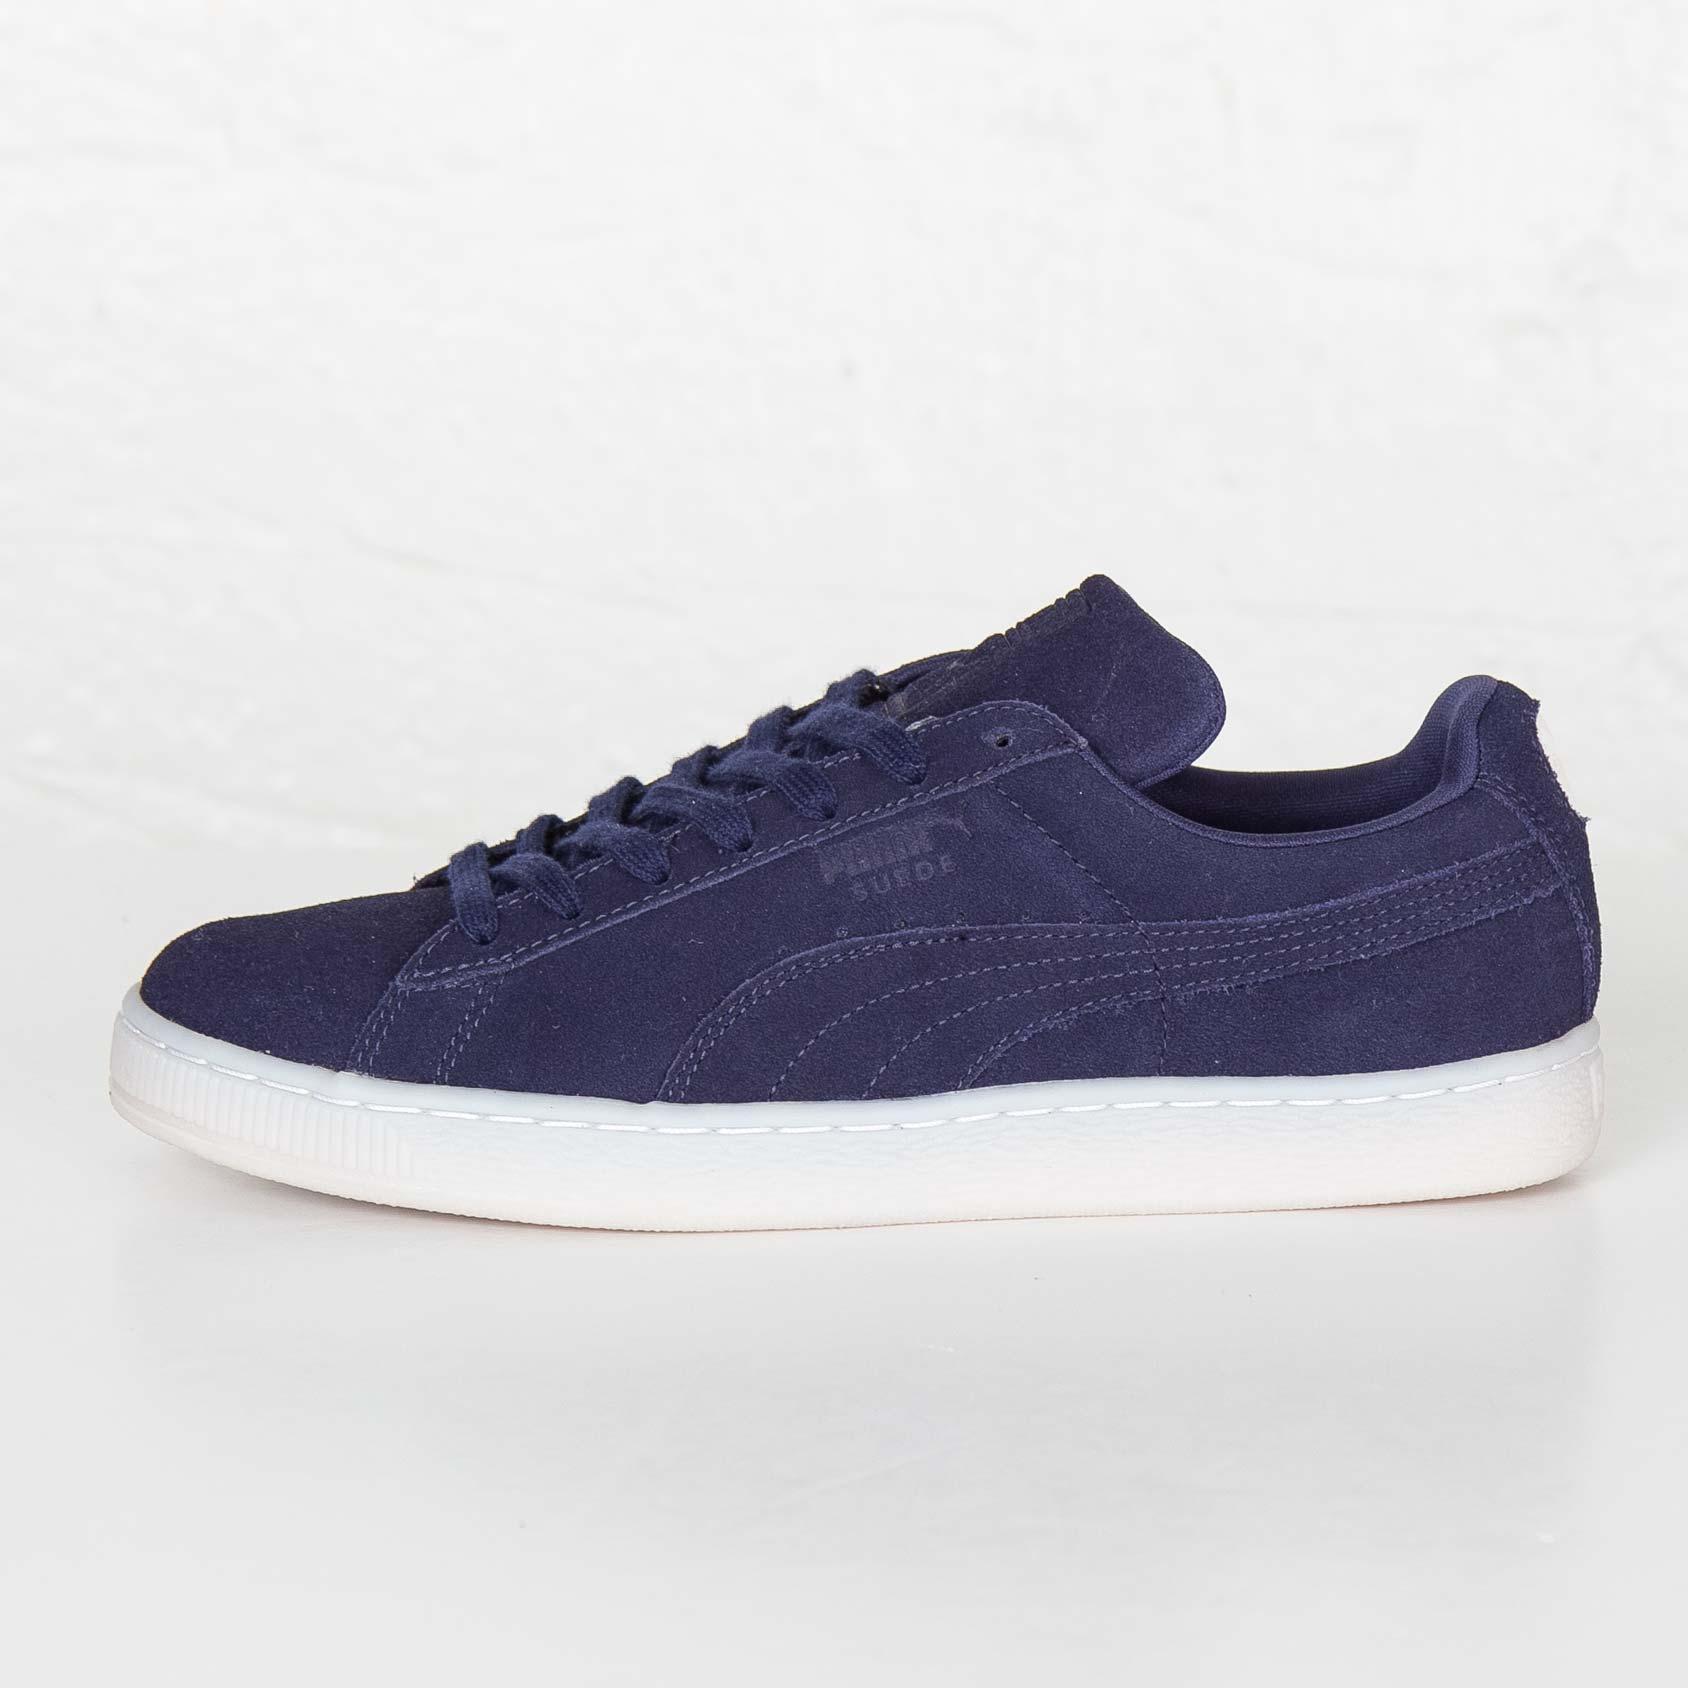 Puma Suede Classic Colored - 360850-01 - Sneakersnstuff  e98f1aa8d